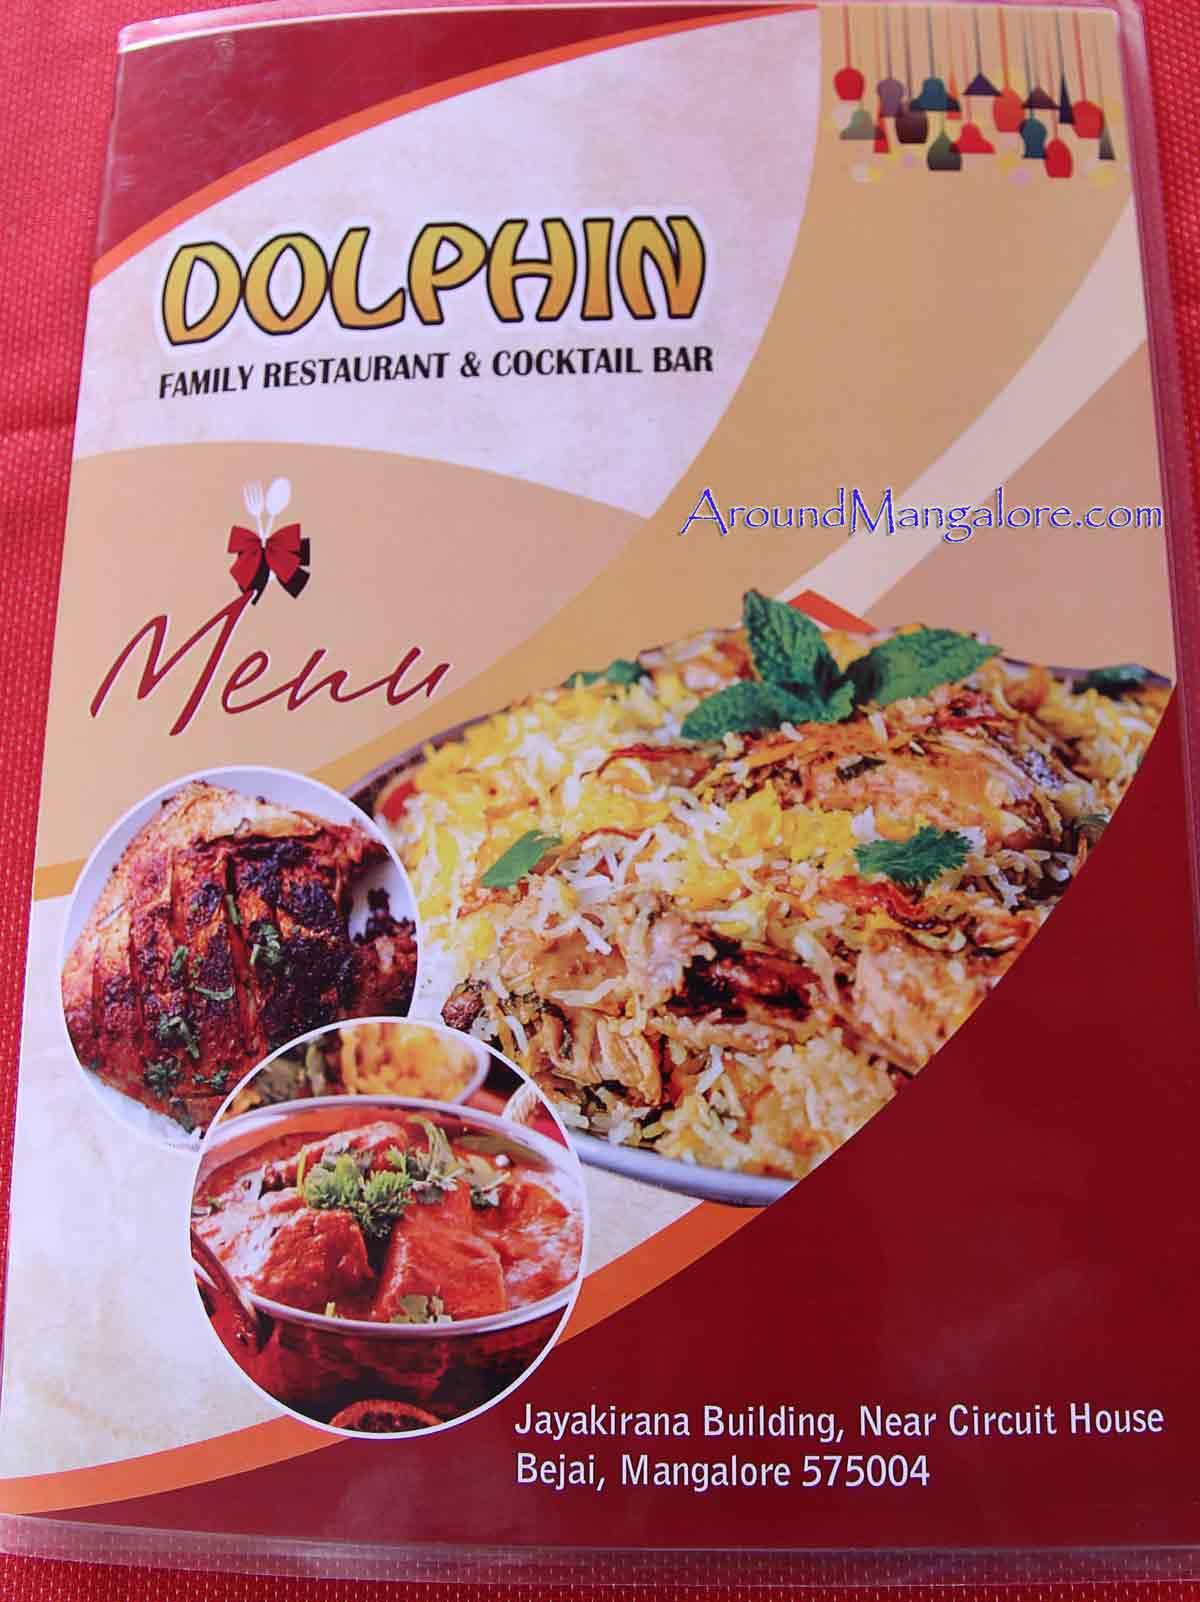 Food Menu - Dolphin Restaurant & Cocktail Bar, Bejai